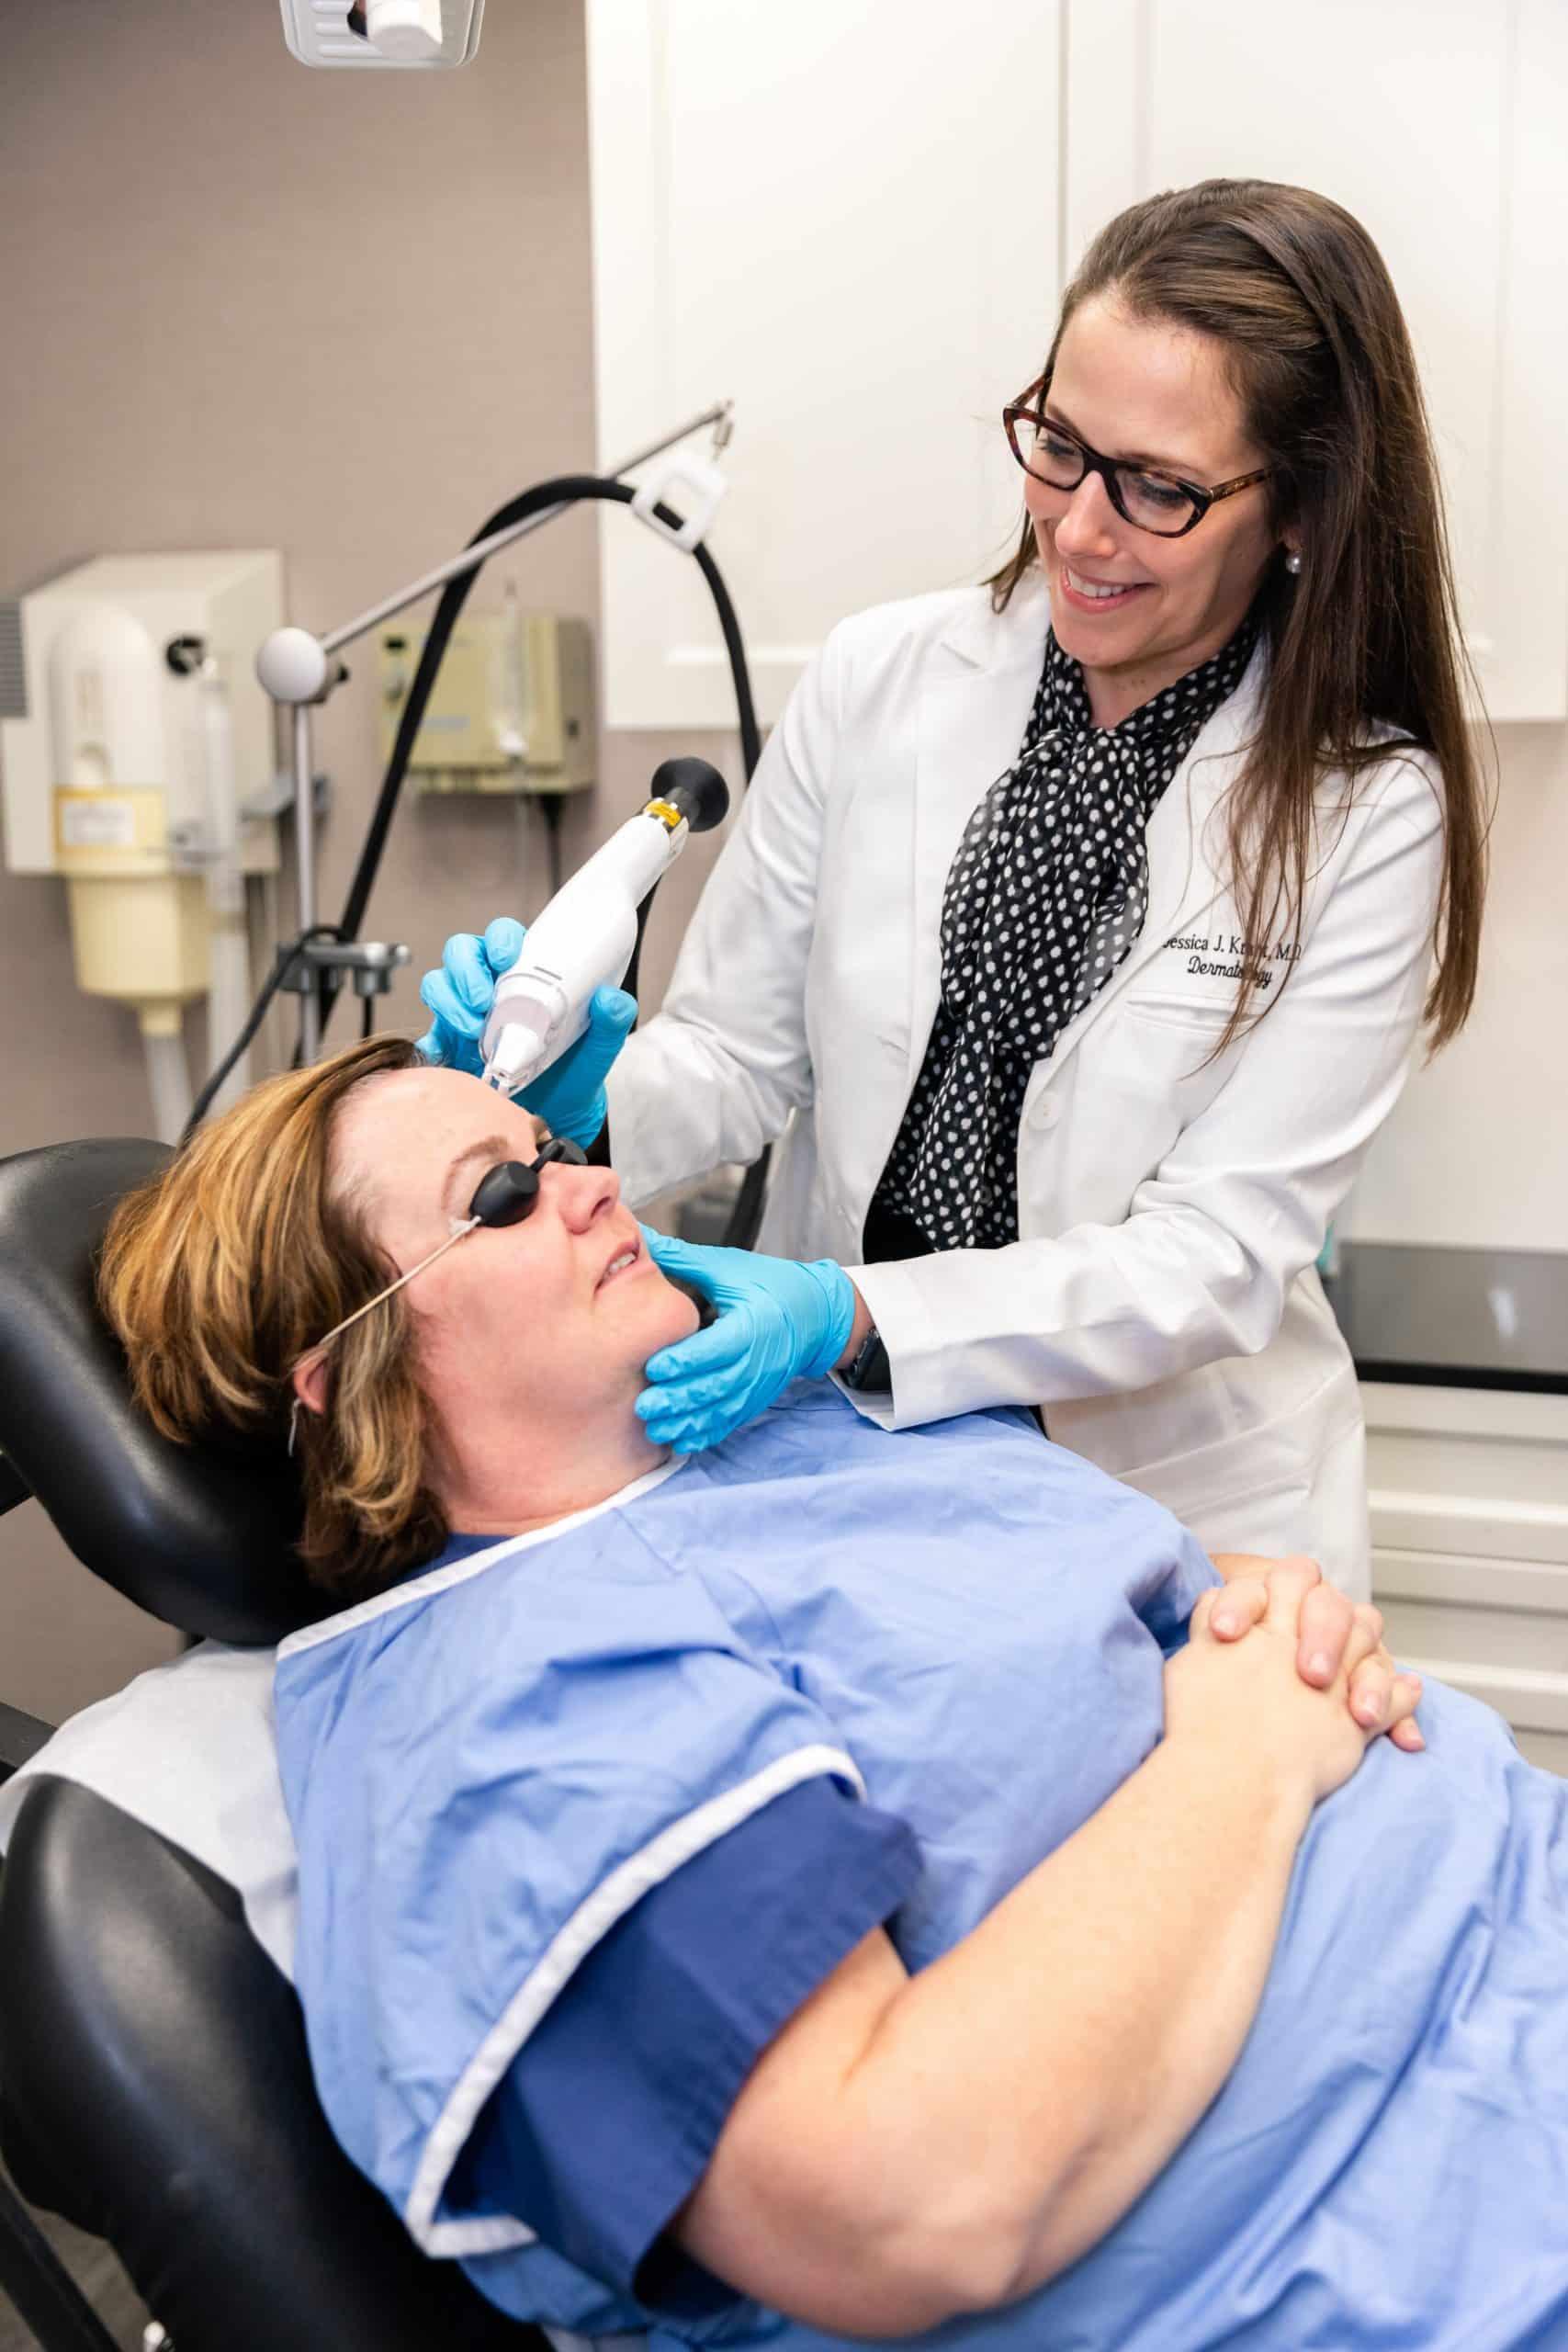 birthmark removal treatment in new york